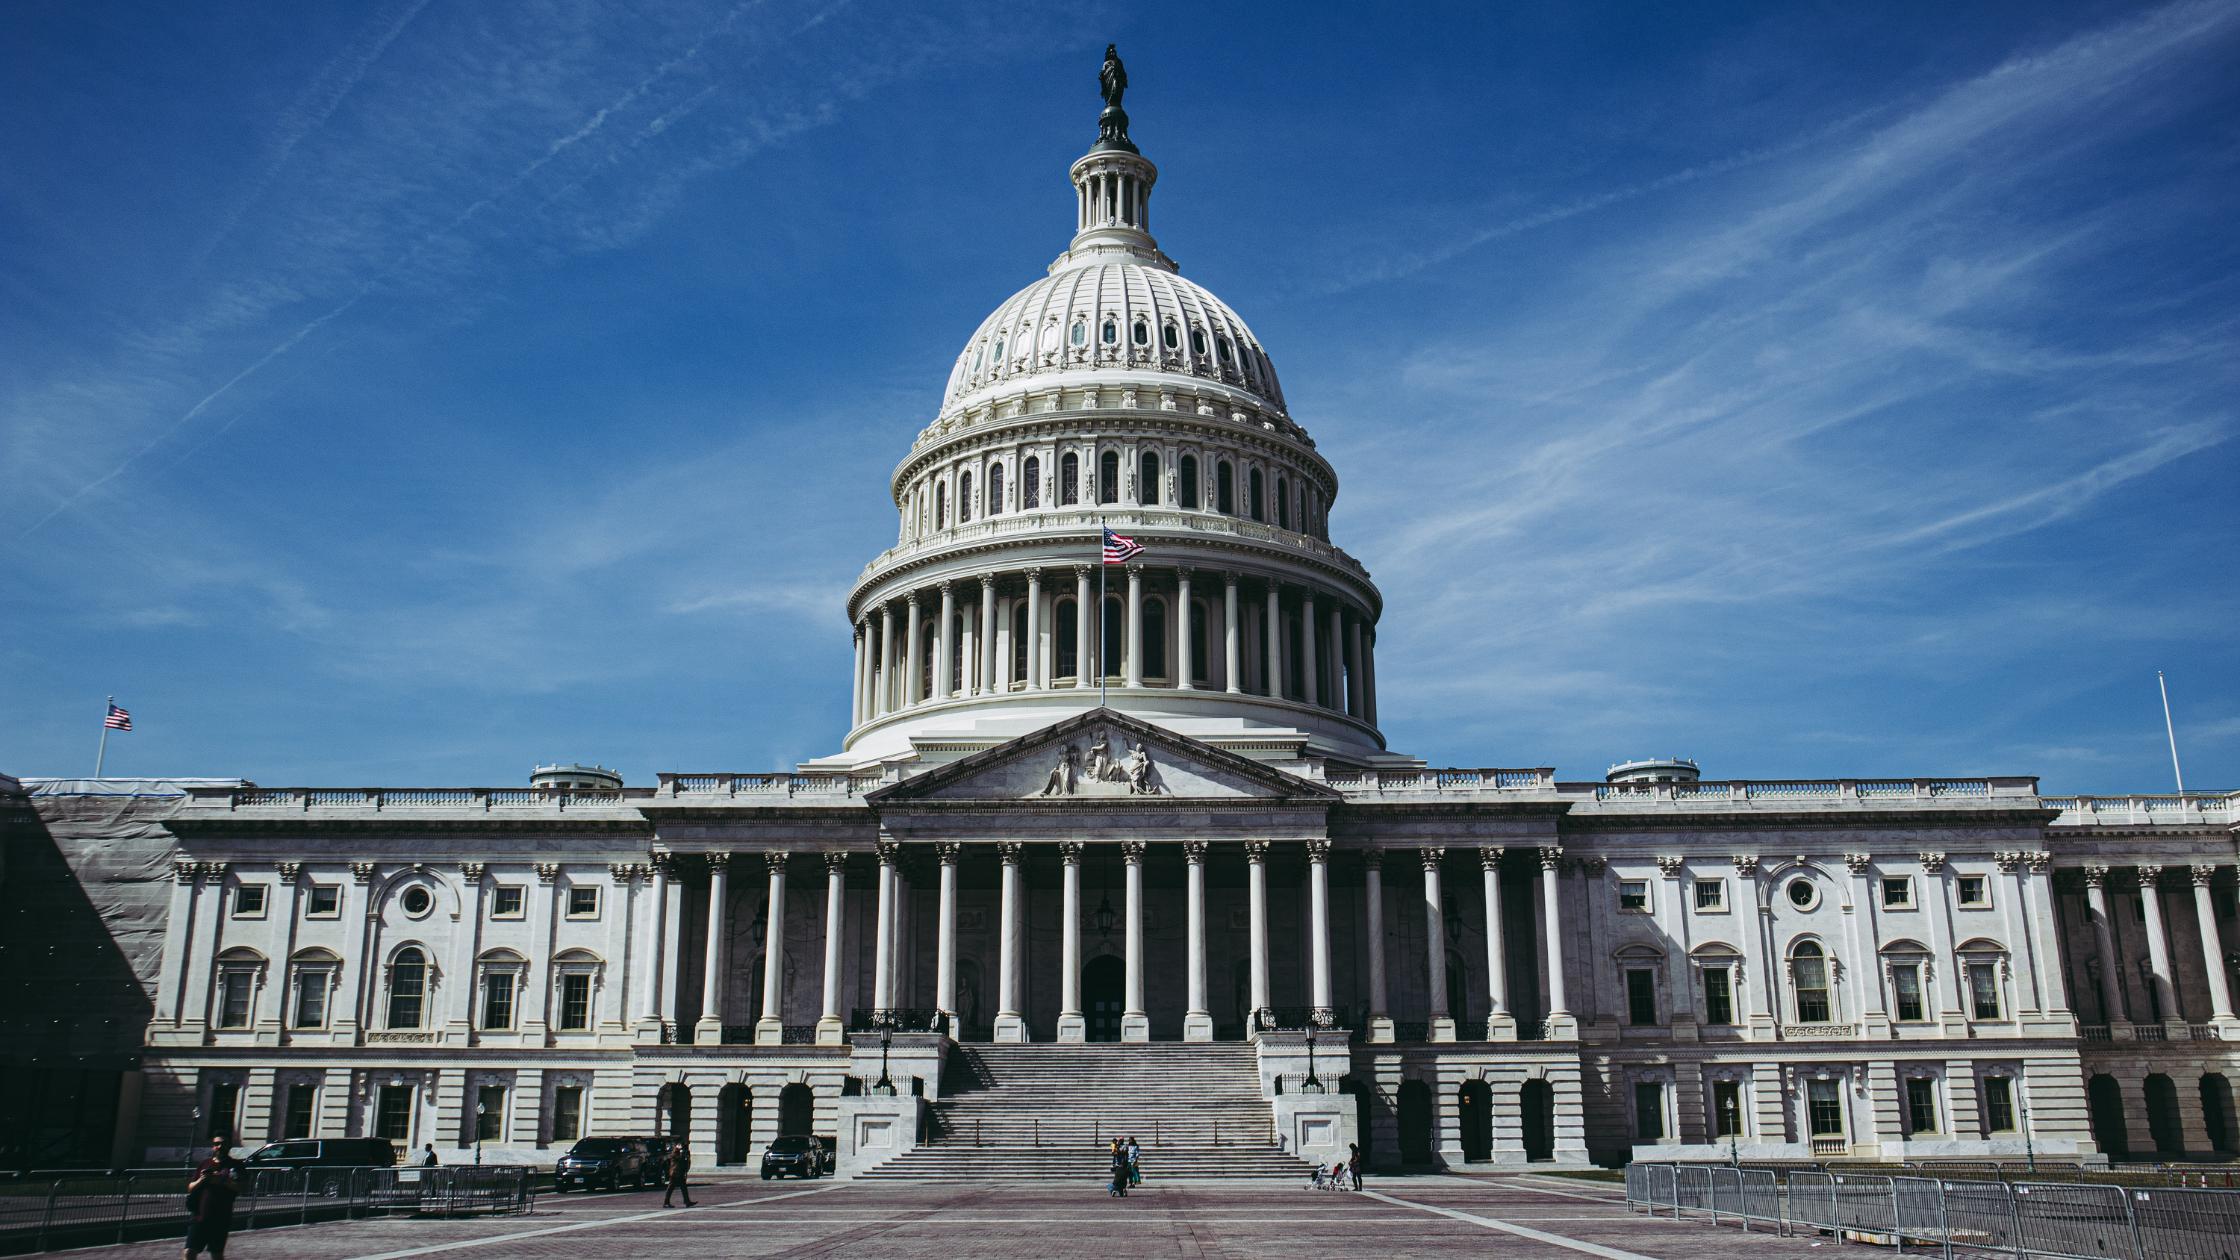 political building